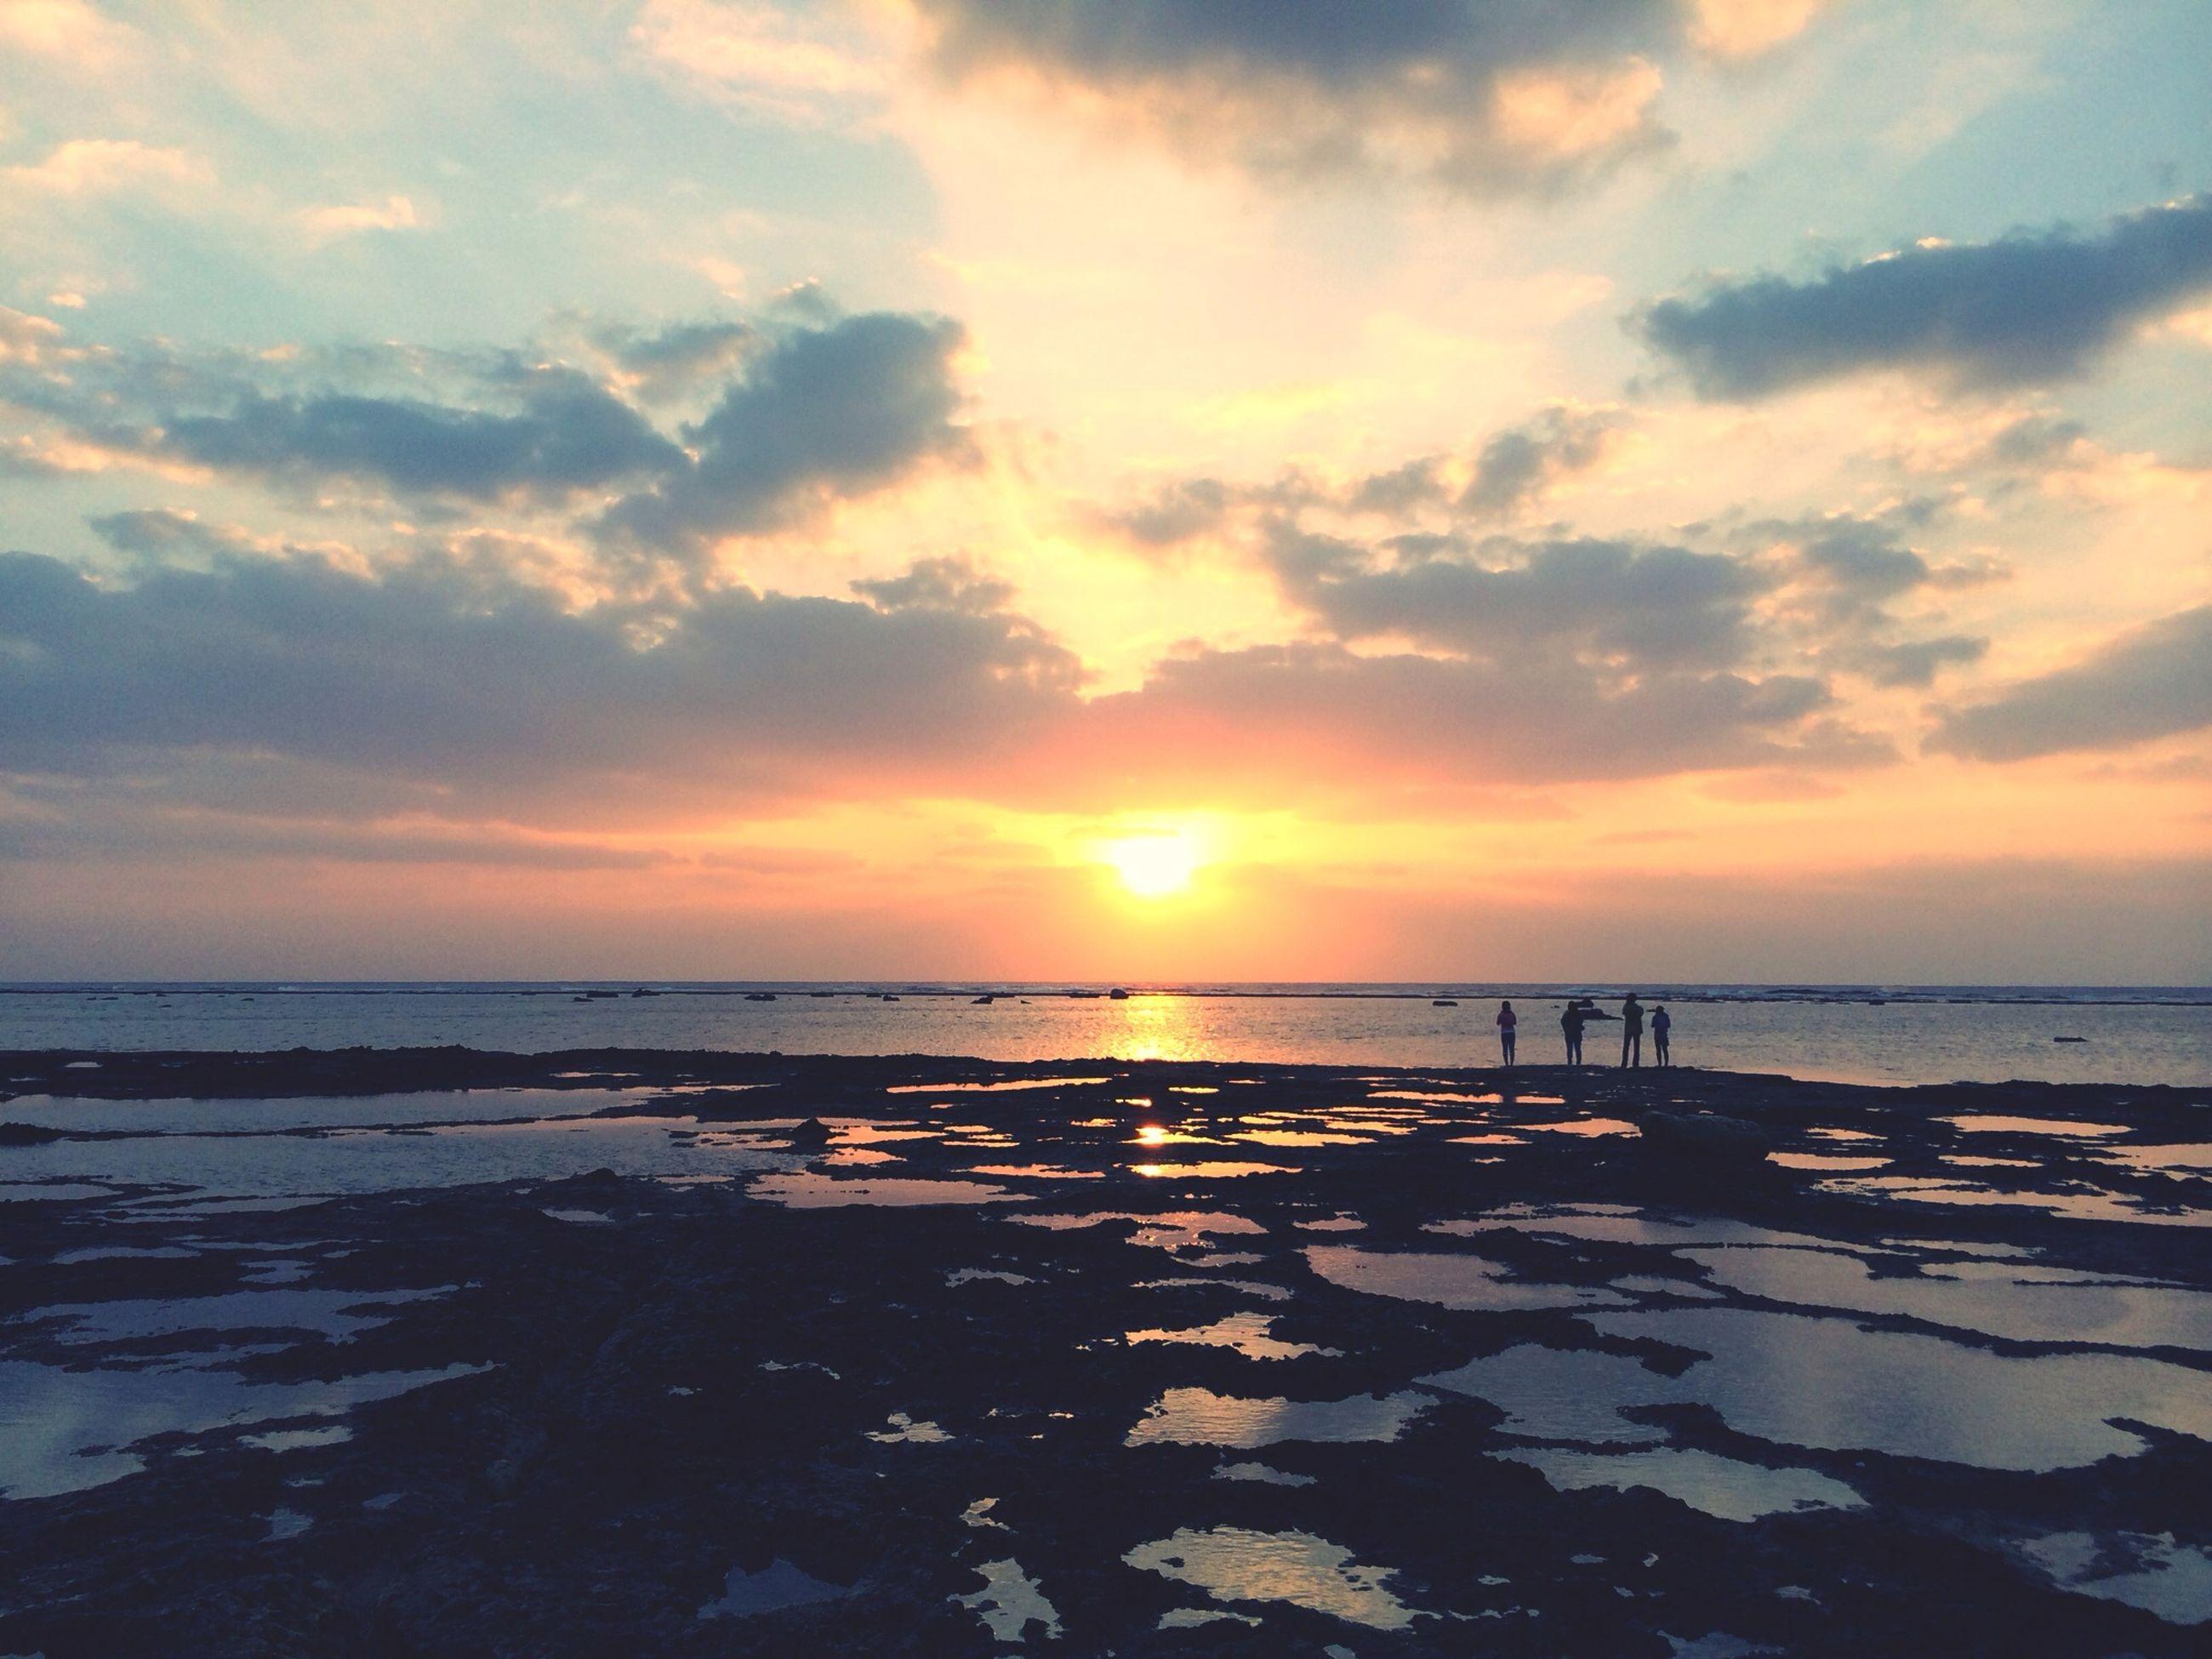 sunset, sea, water, scenics, sky, tranquil scene, tranquility, beauty in nature, horizon over water, beach, sun, cloud - sky, orange color, nature, shore, idyllic, reflection, silhouette, sunlight, cloud